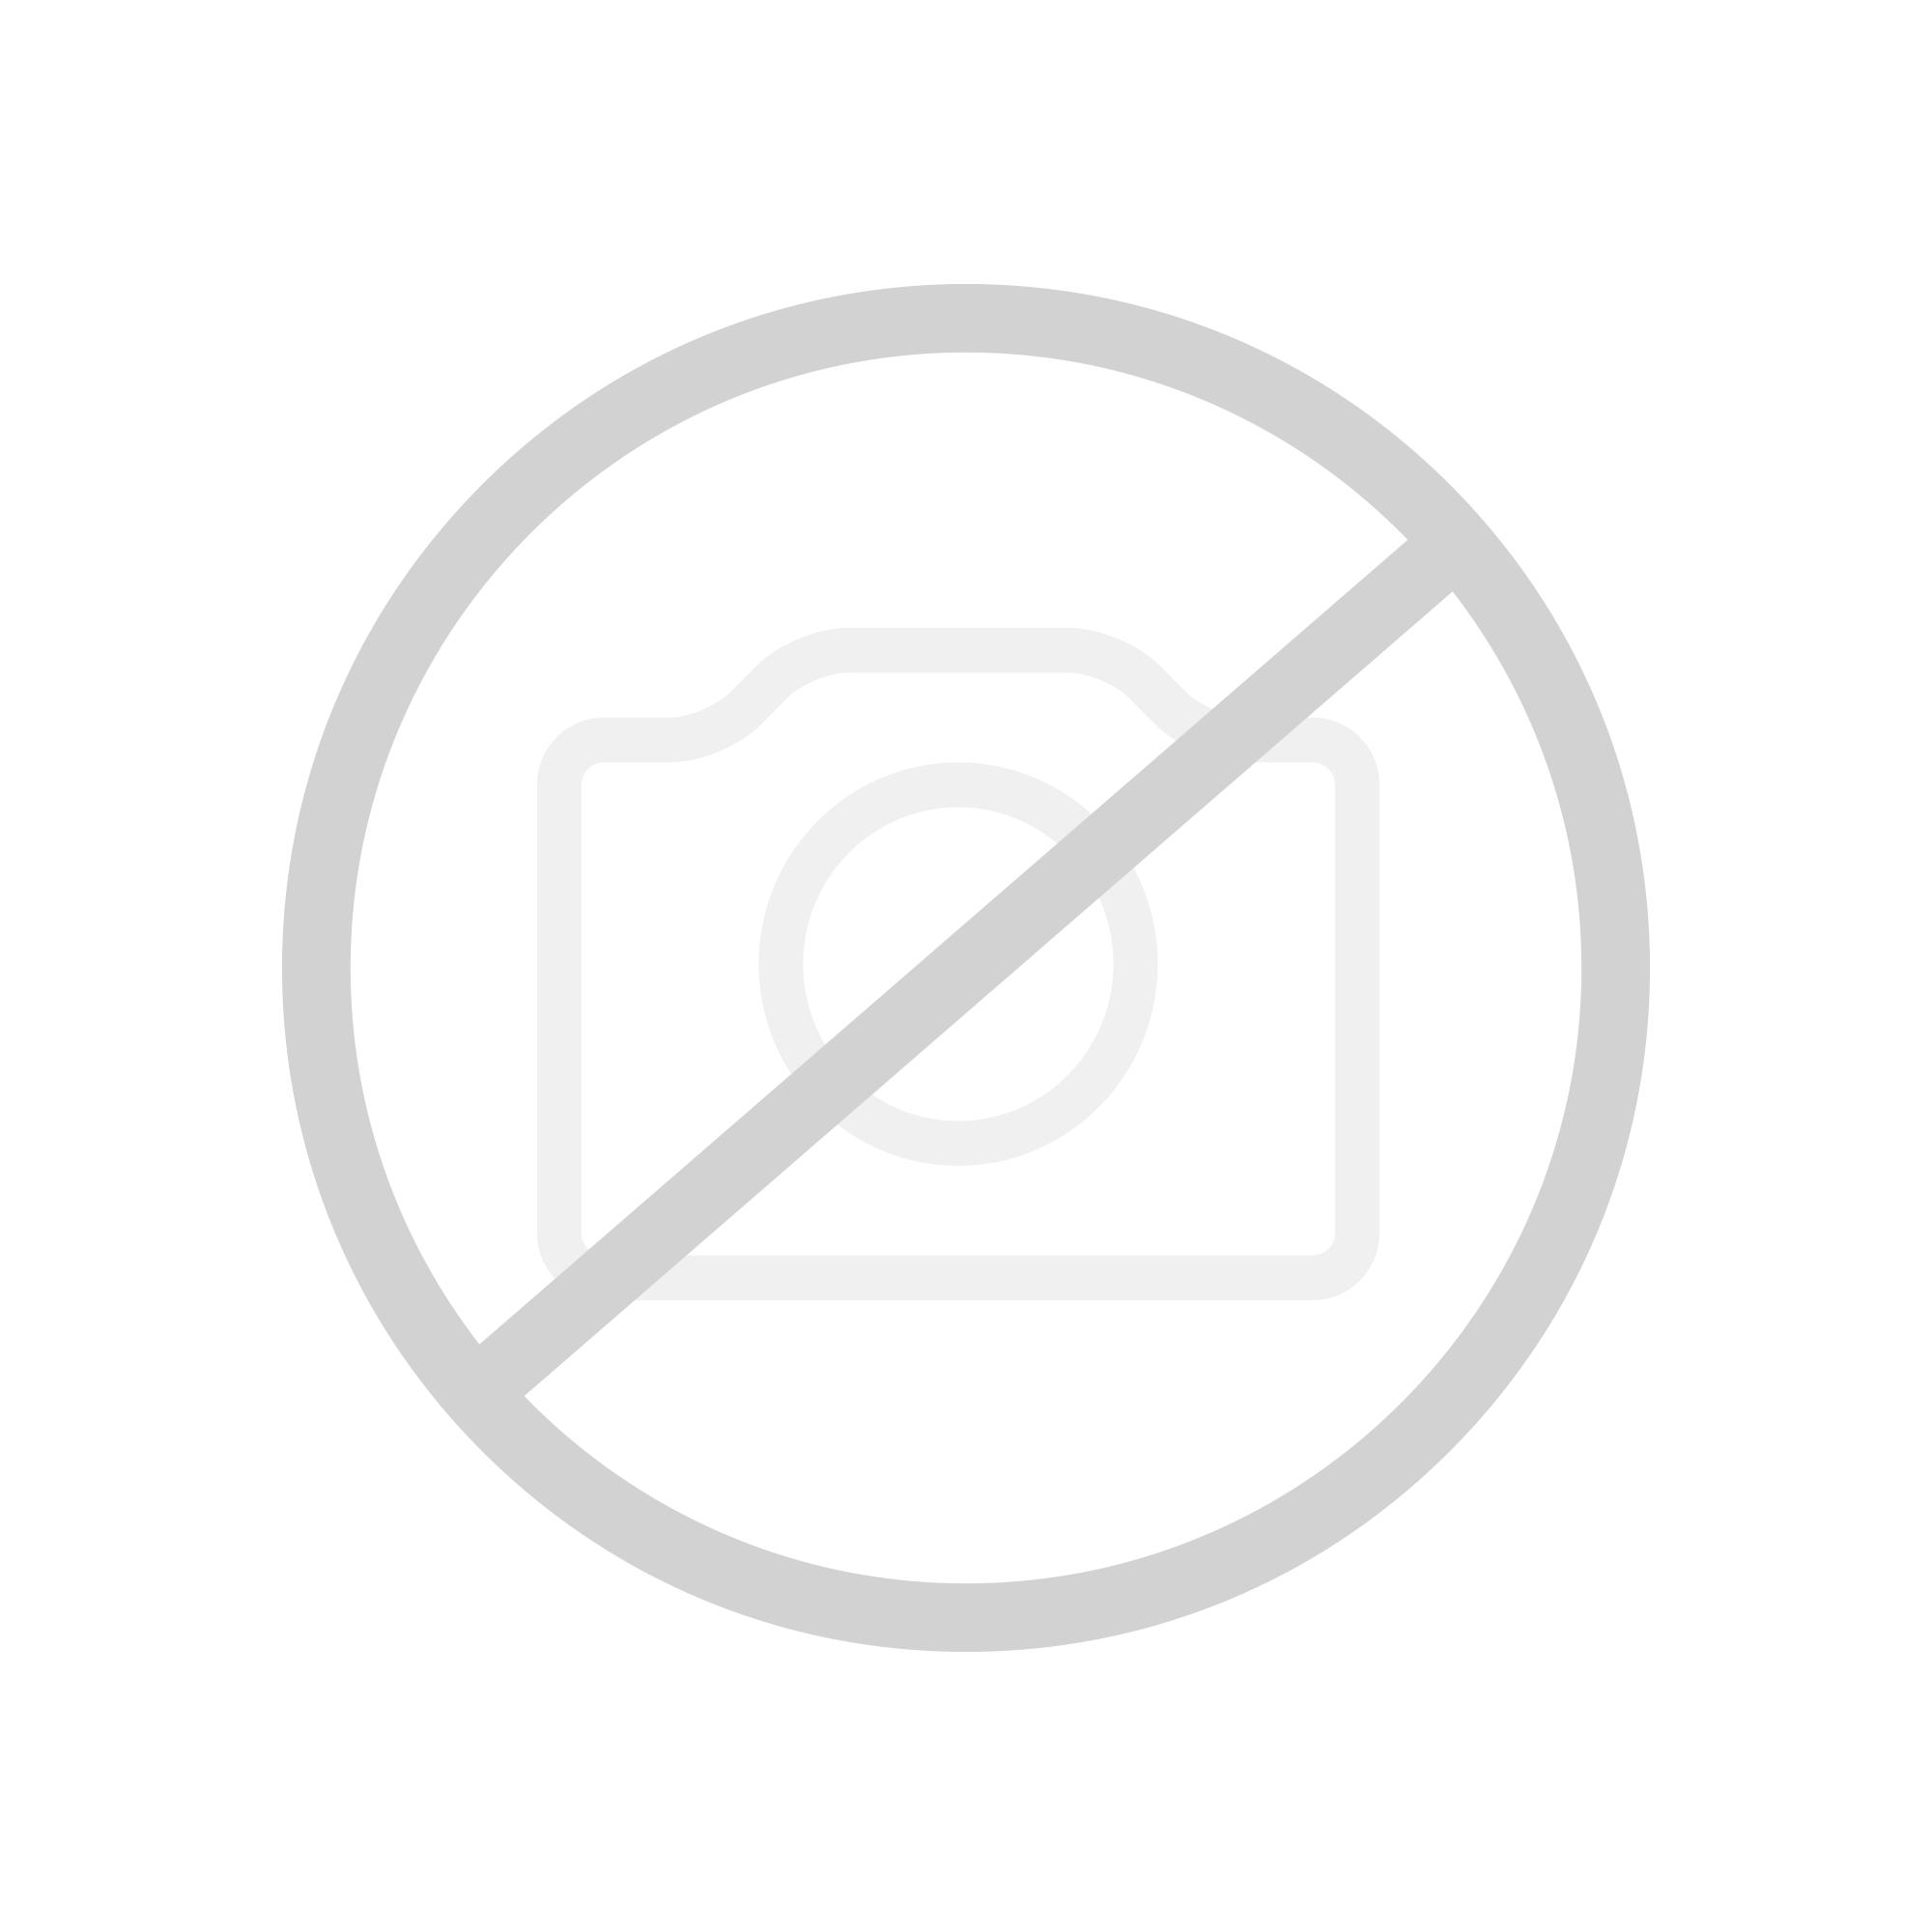 geberit monolith sanit rmodul f r wand wt 2 loch armatur mischer rechts ohne auszug glas. Black Bedroom Furniture Sets. Home Design Ideas